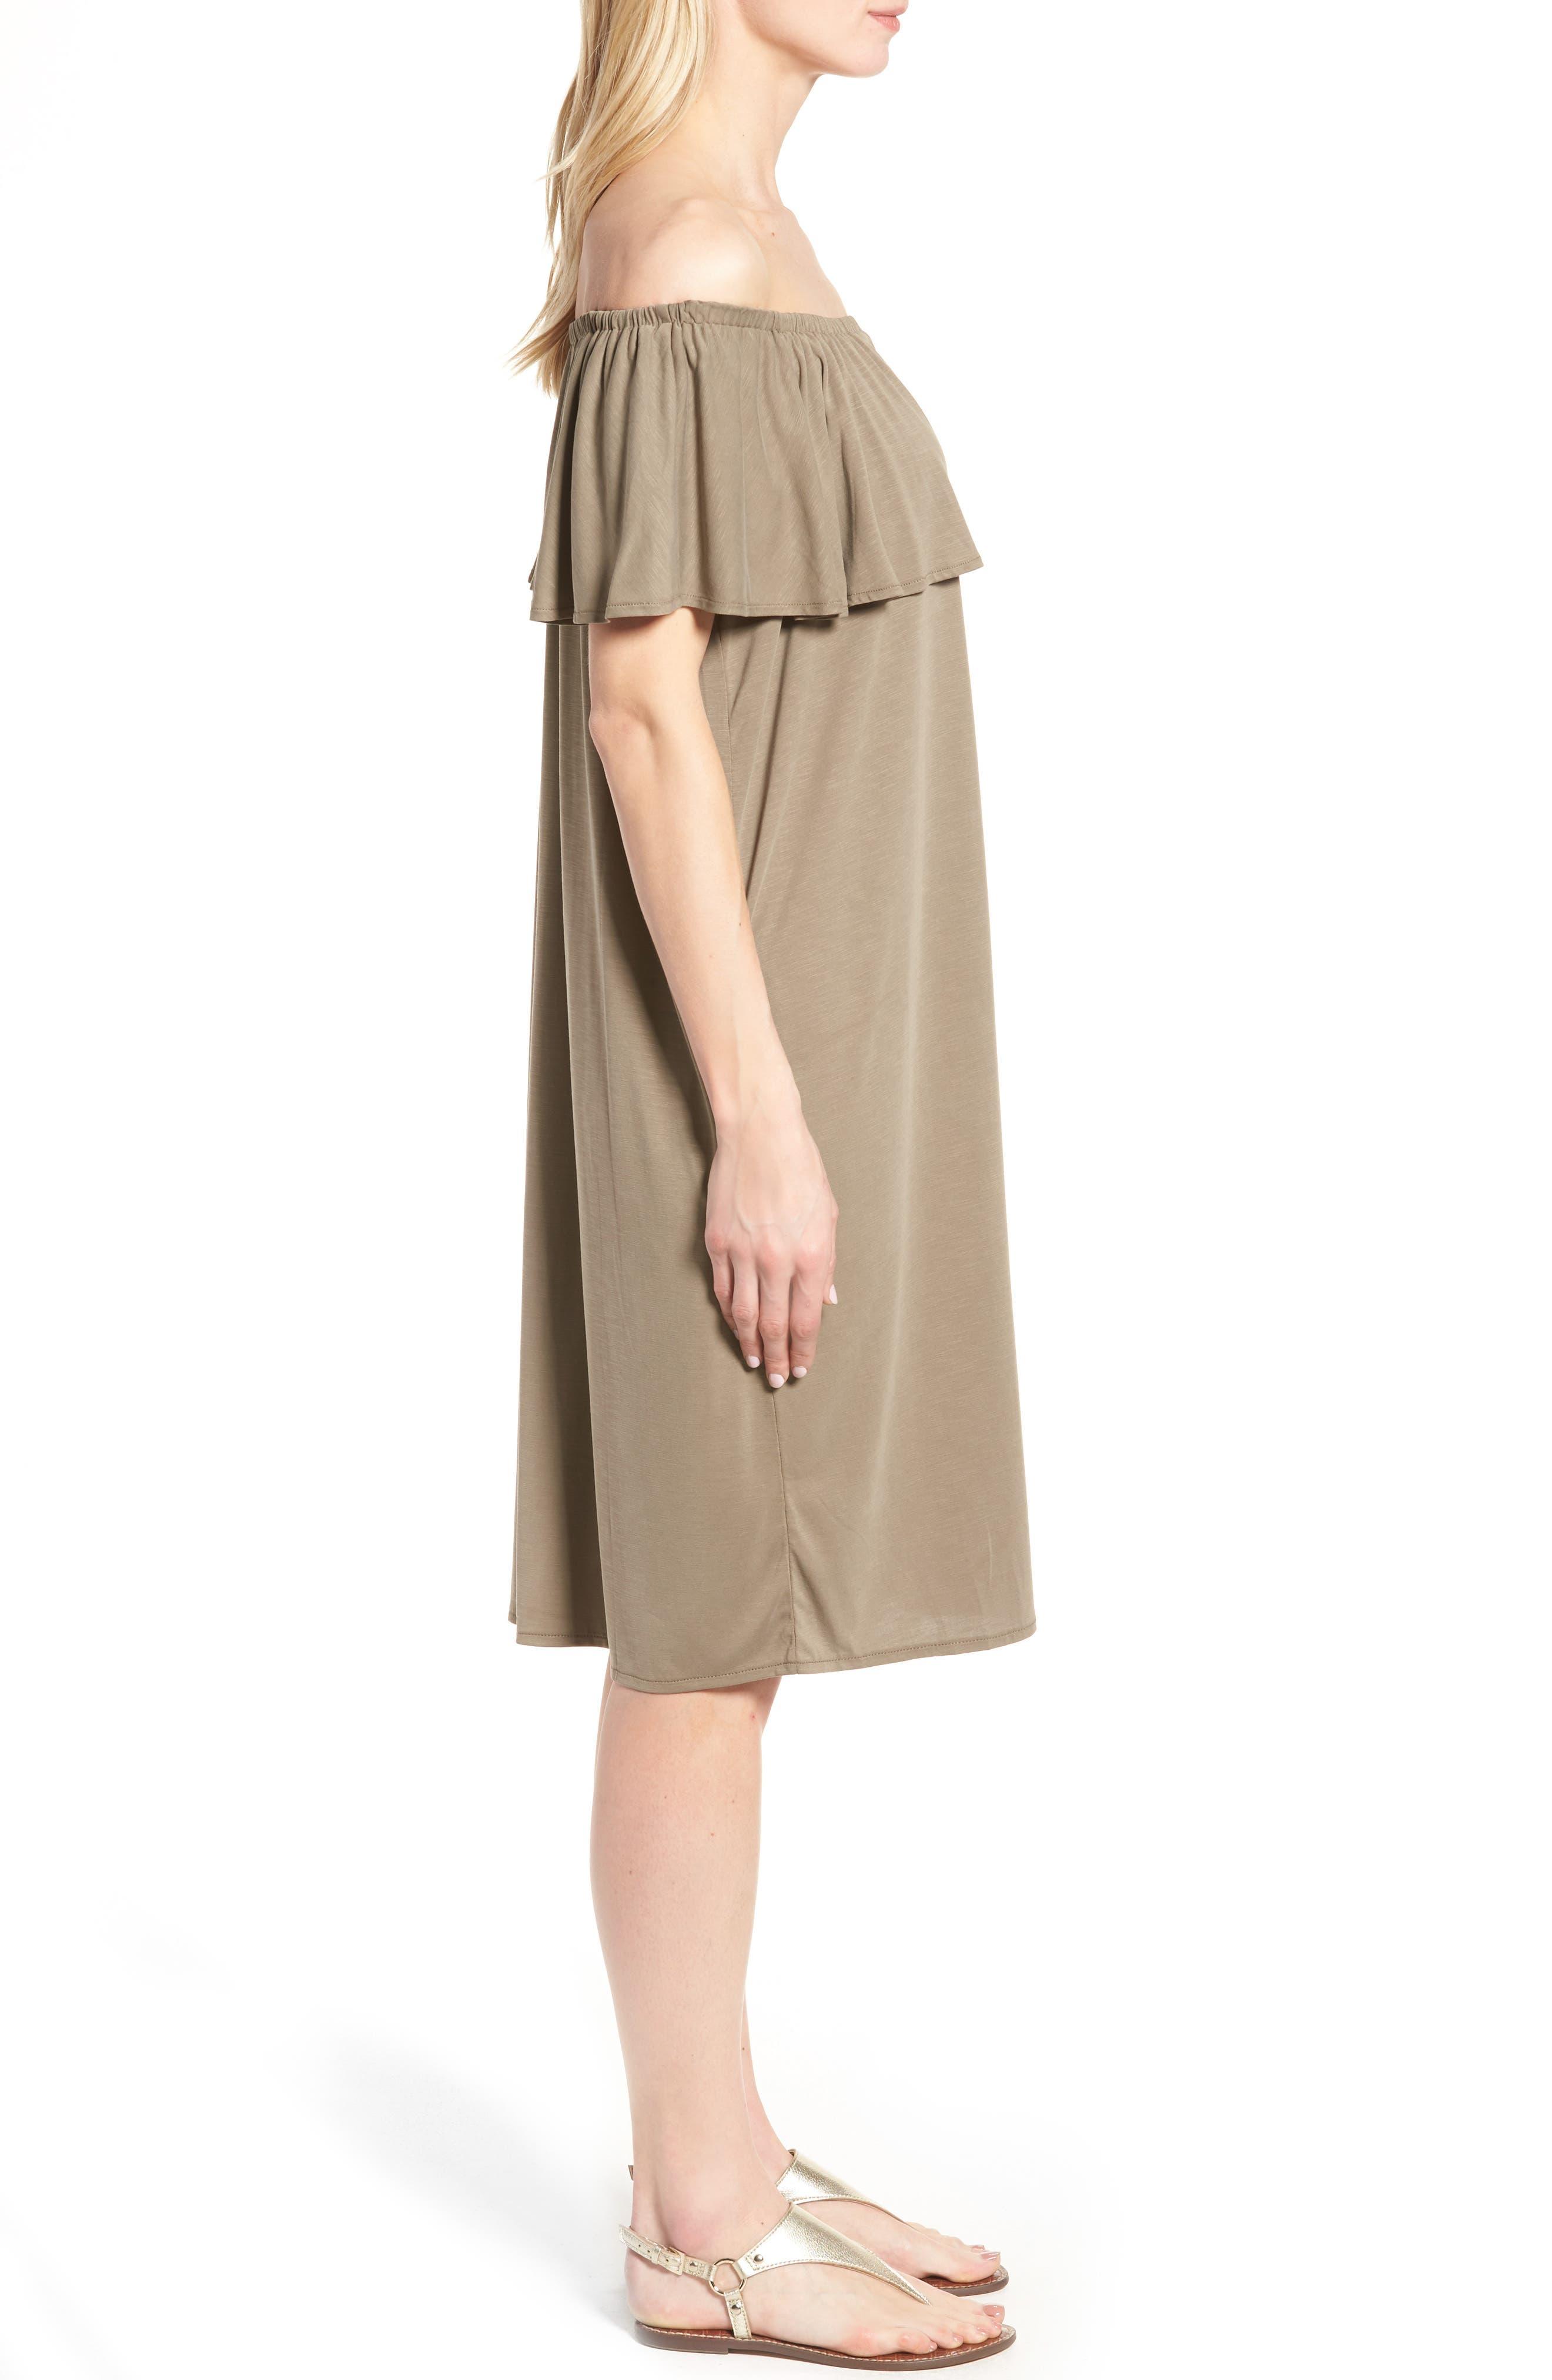 Boardwalk Convertible Jersey Dress,                             Alternate thumbnail 3, color,                             Washed Marshland